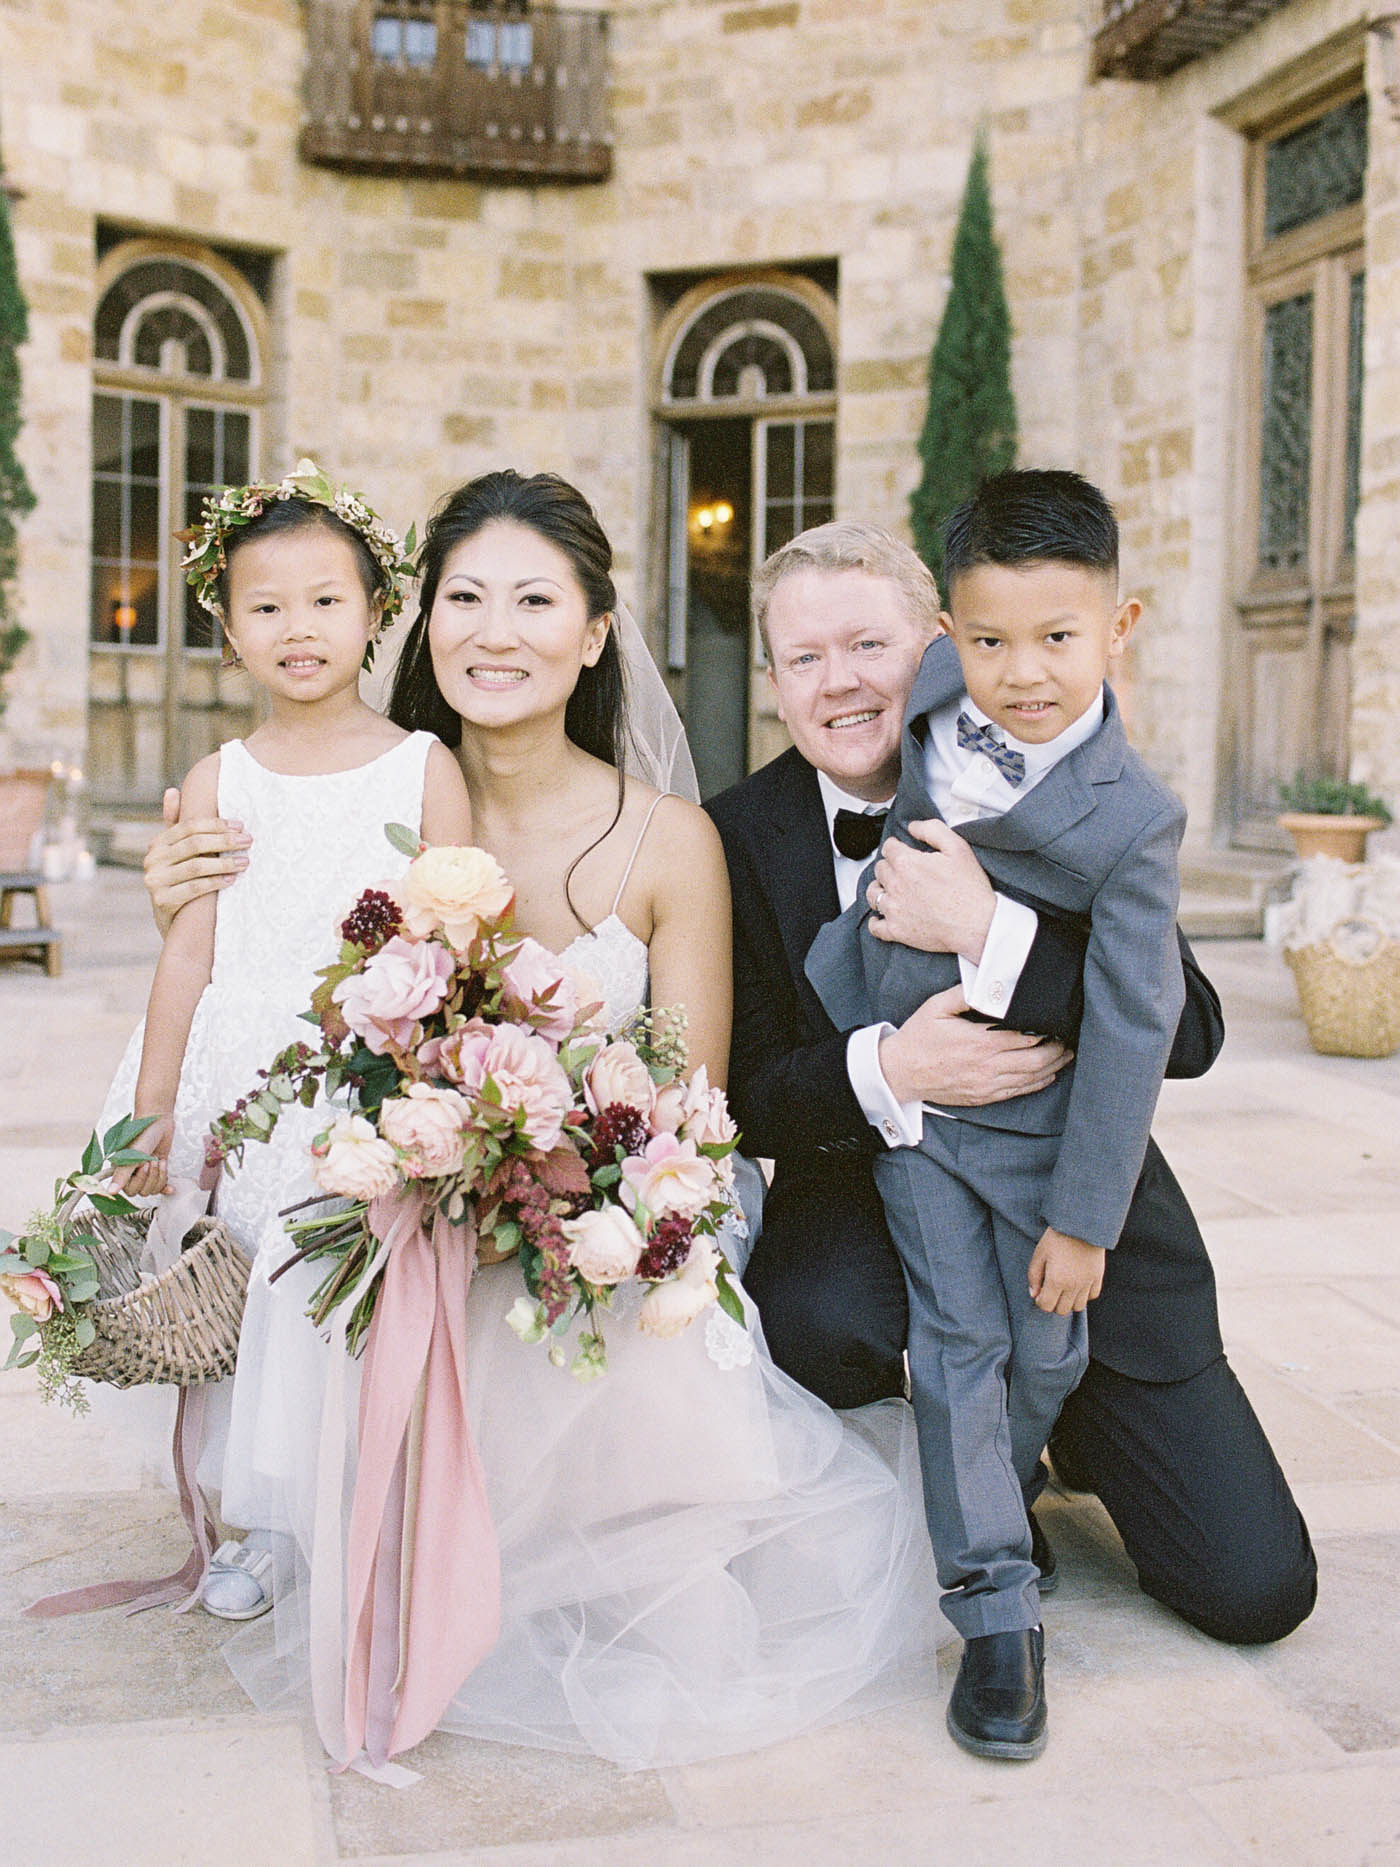 sunstone-villa-wedding-36-Jen_Huang-RD-119-Jen_Huang-009571-R1-002.jpg